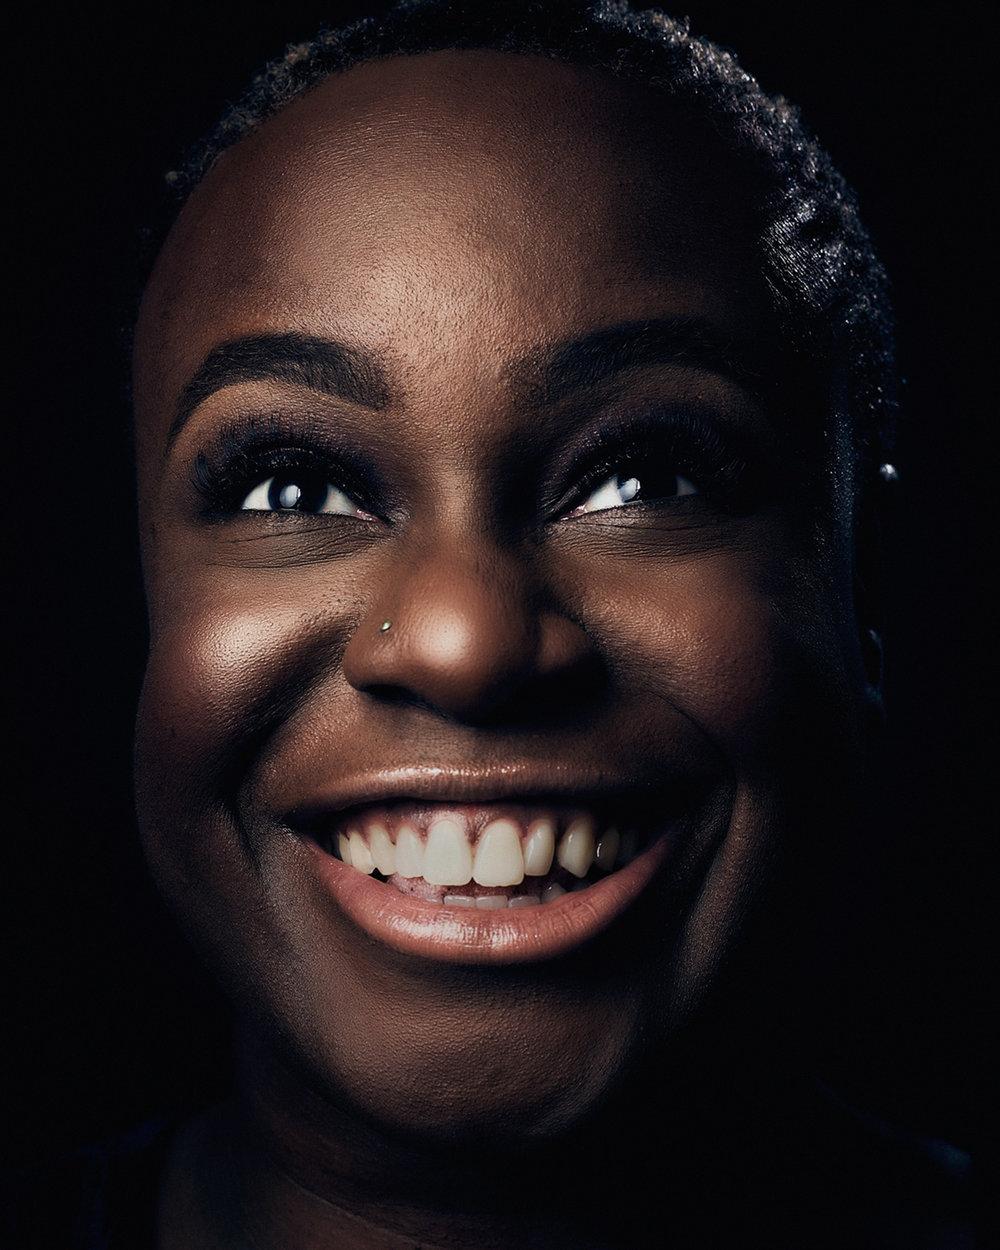 Matthew Joseph - portrait of women laughing